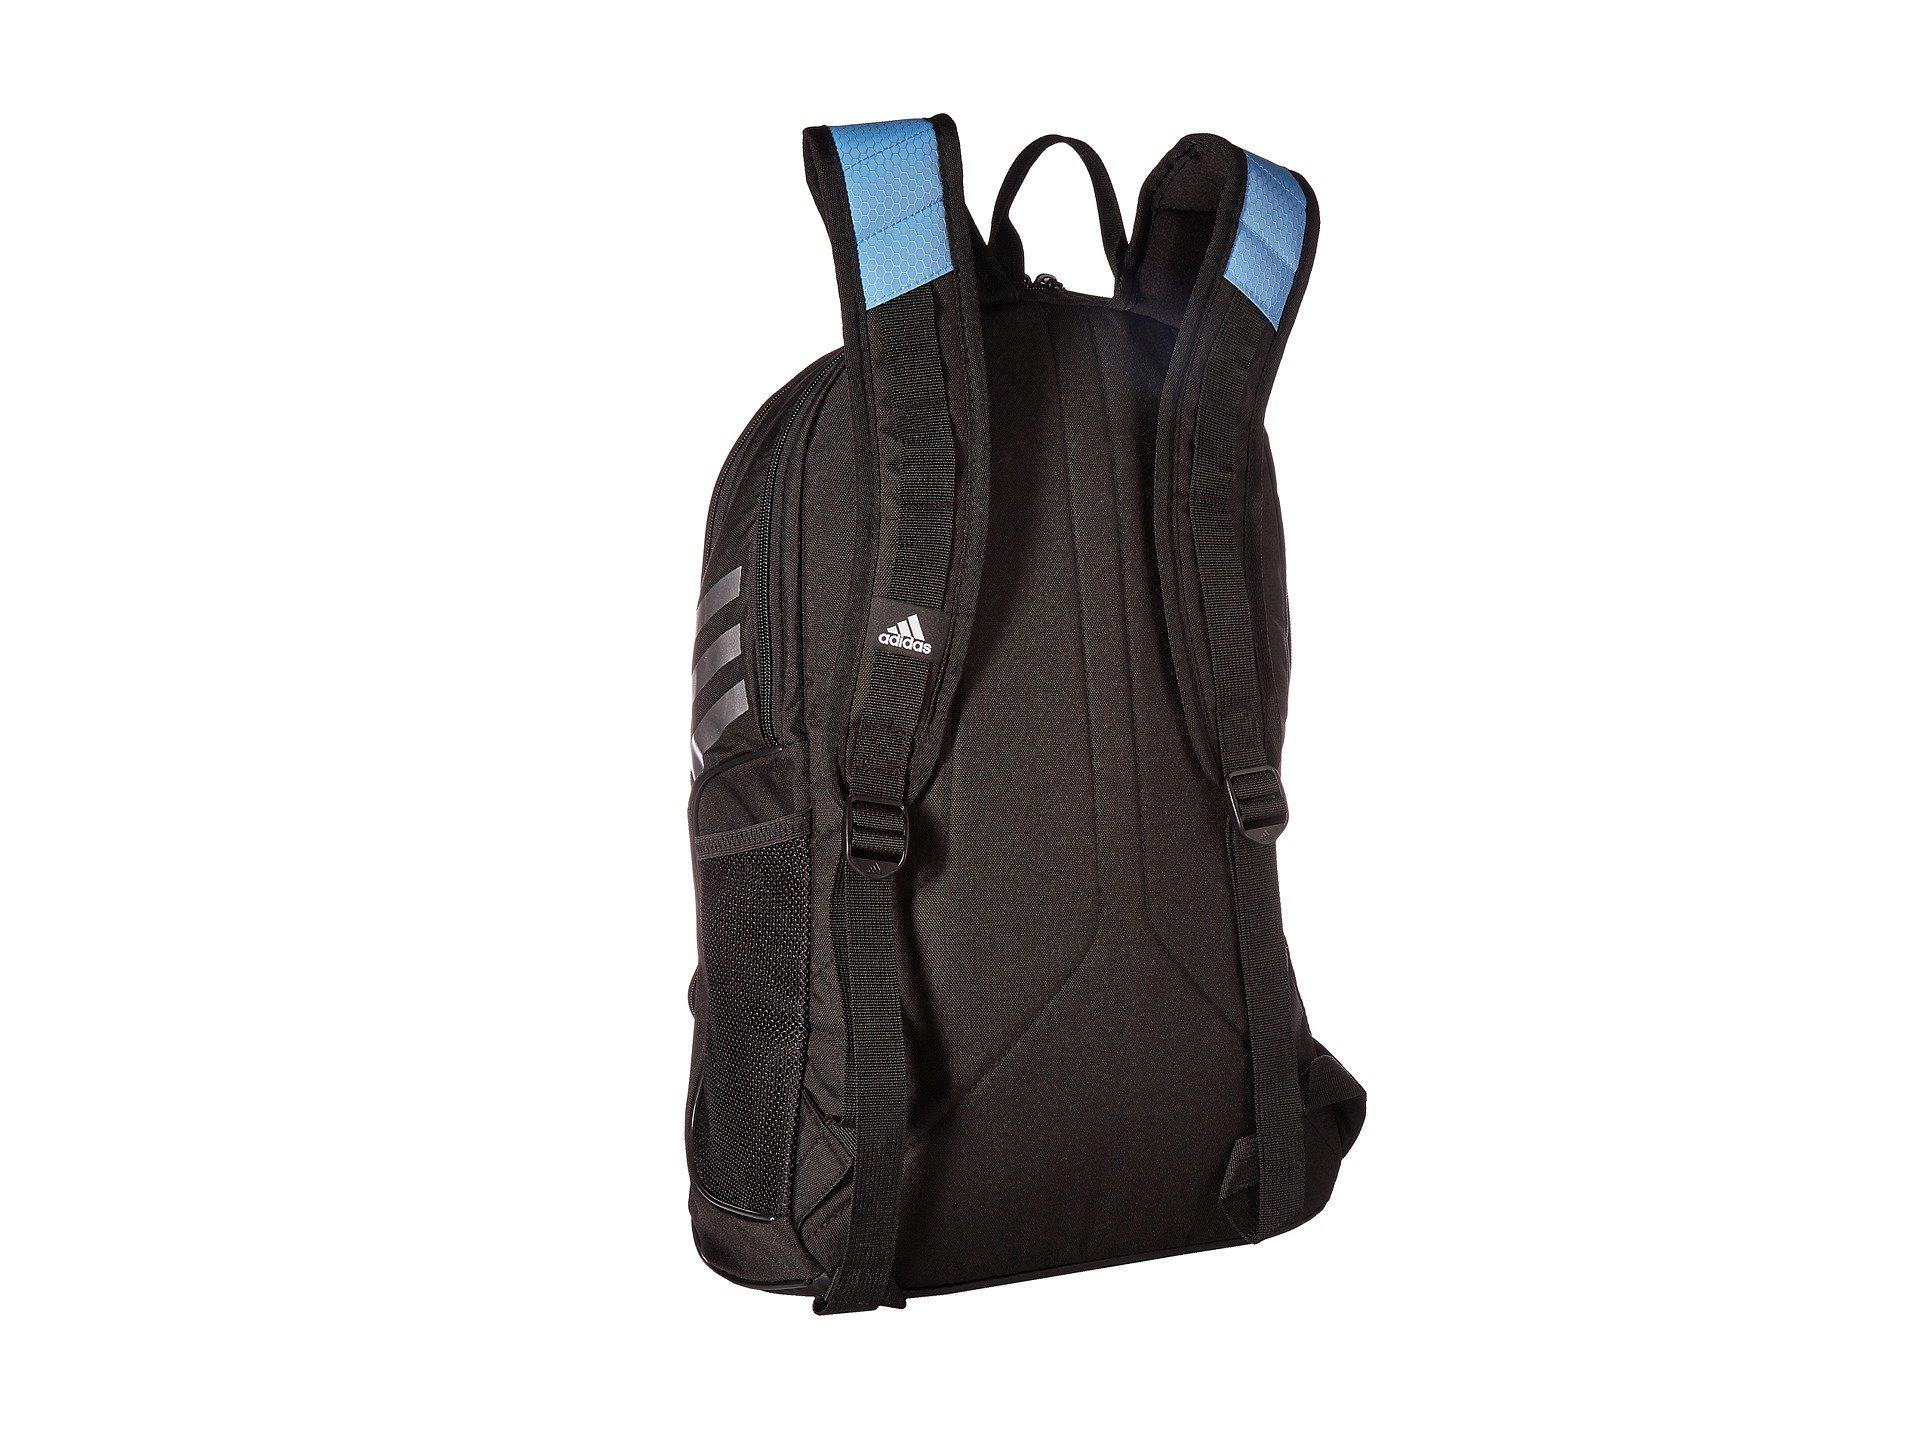 Lyst - adidas Stadium Ii Backpack in Blue fc3190b347f3d